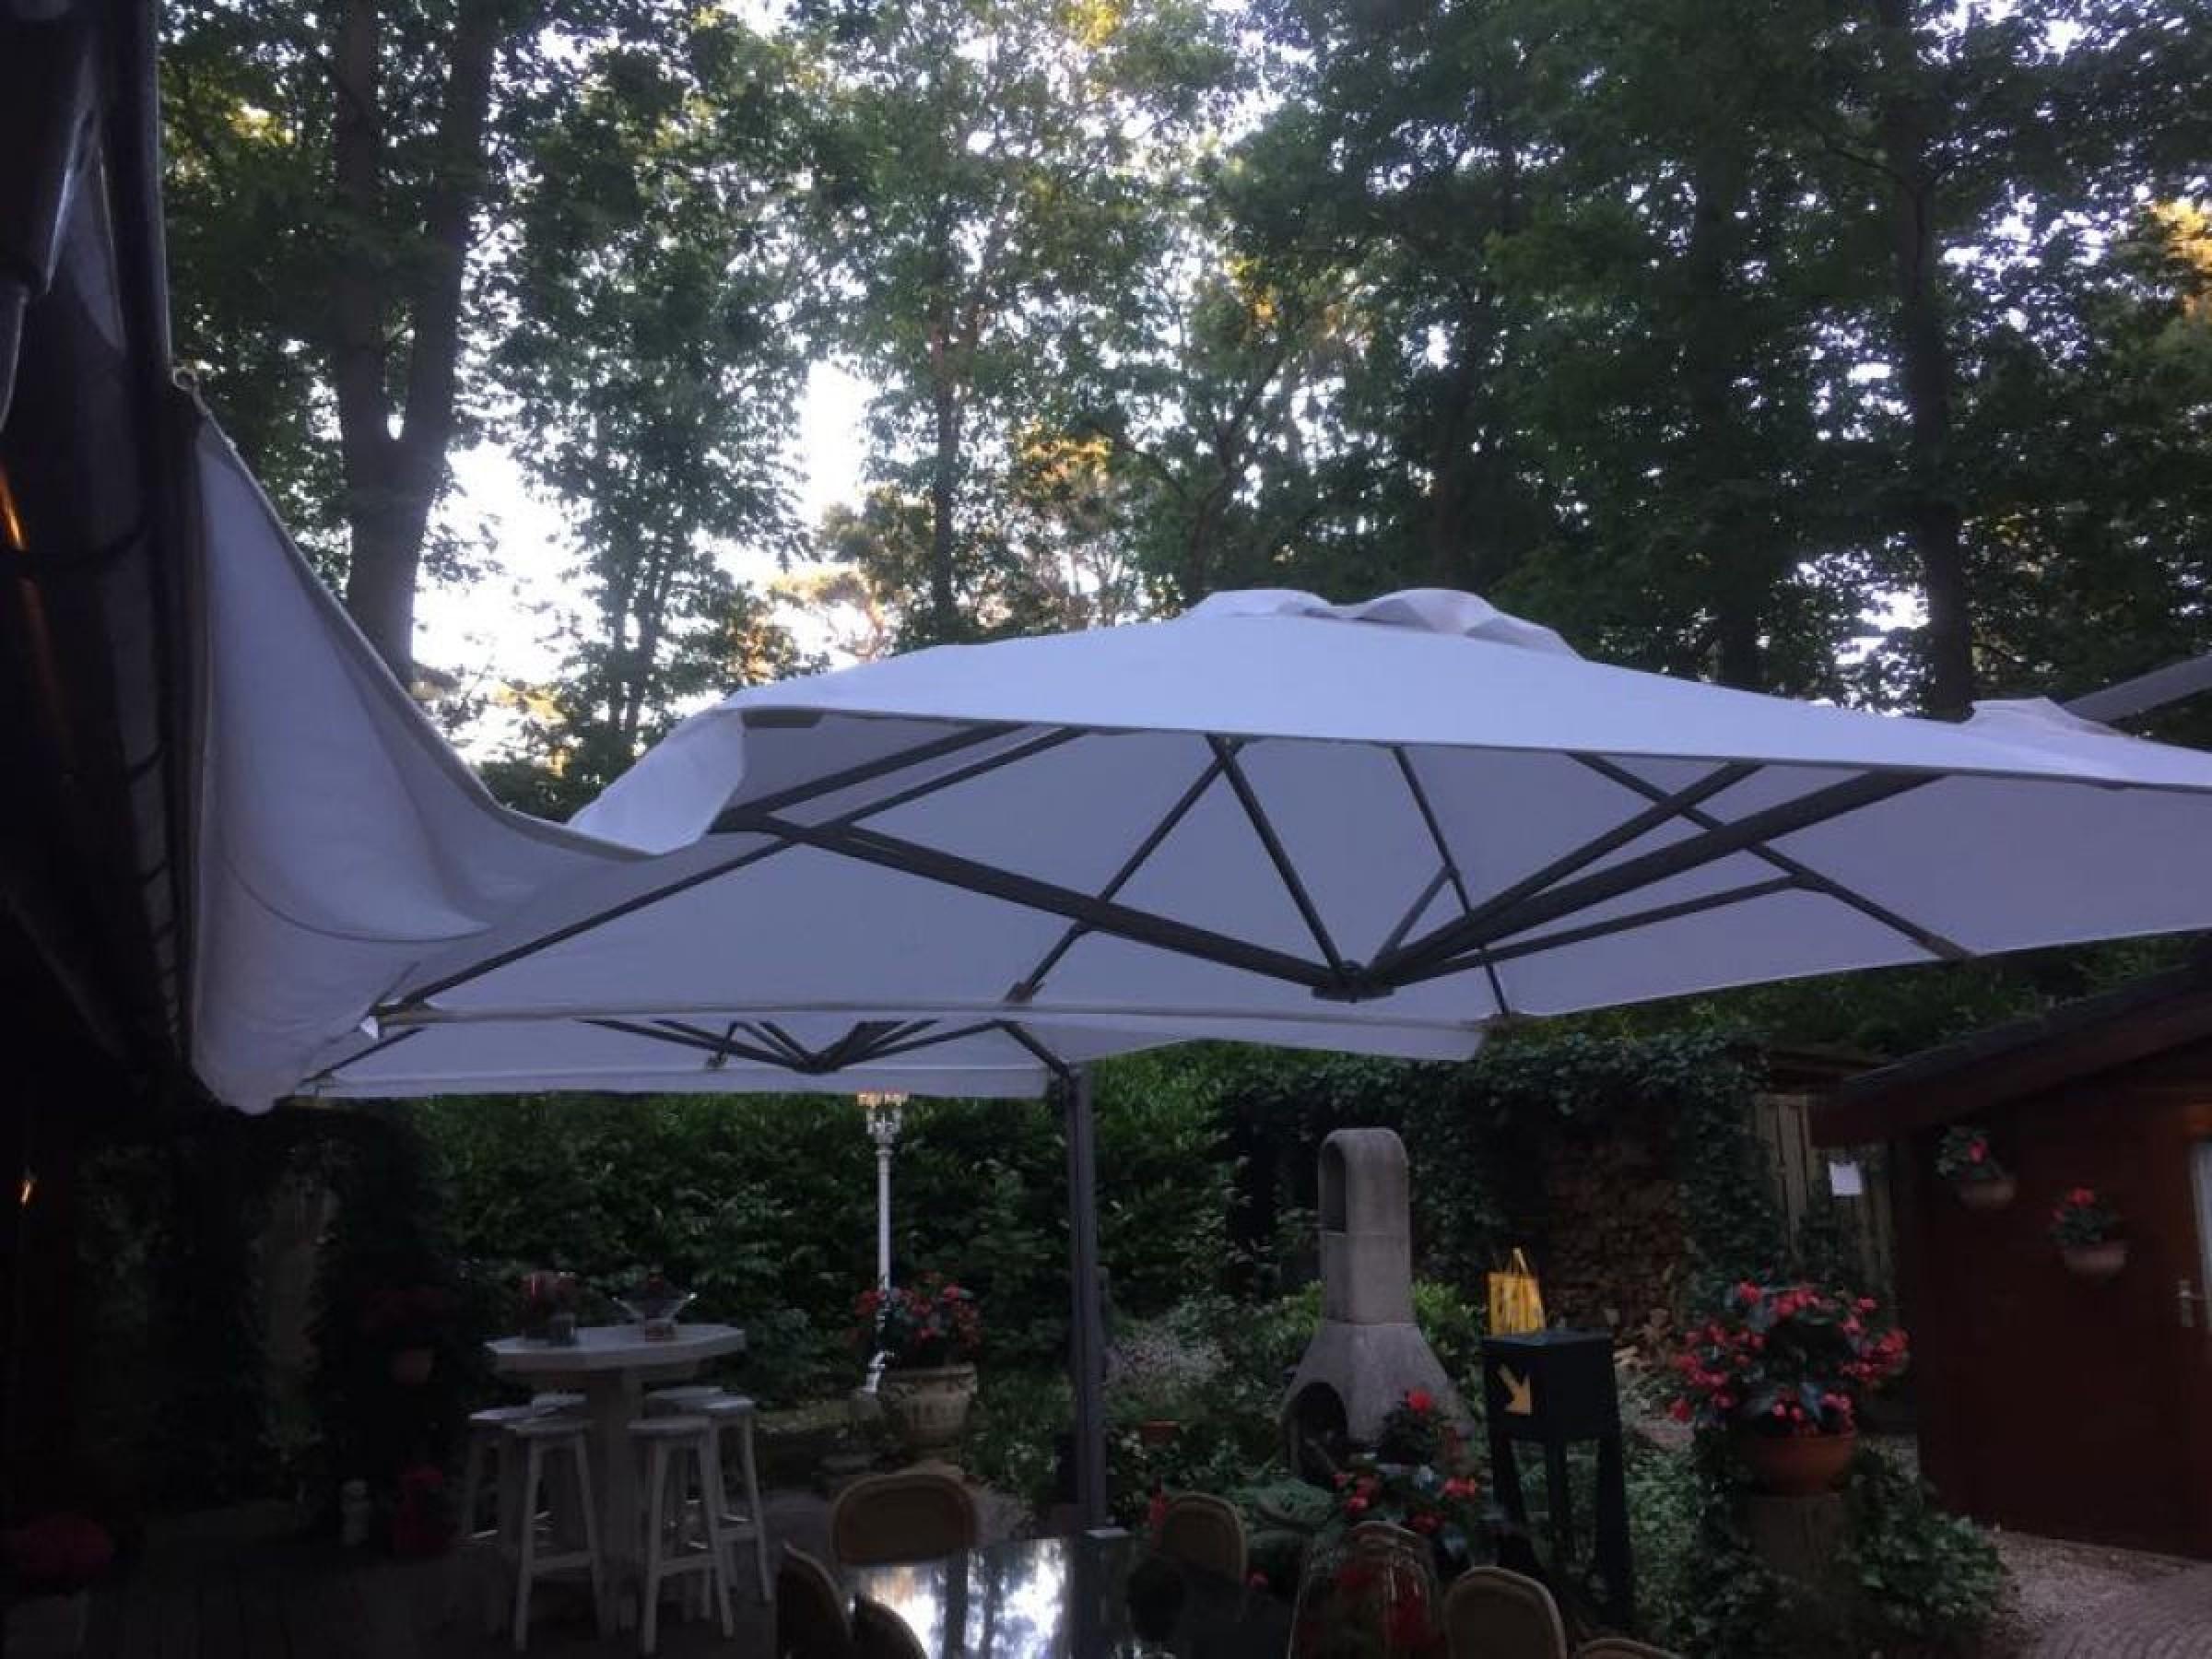 Multipool parasols